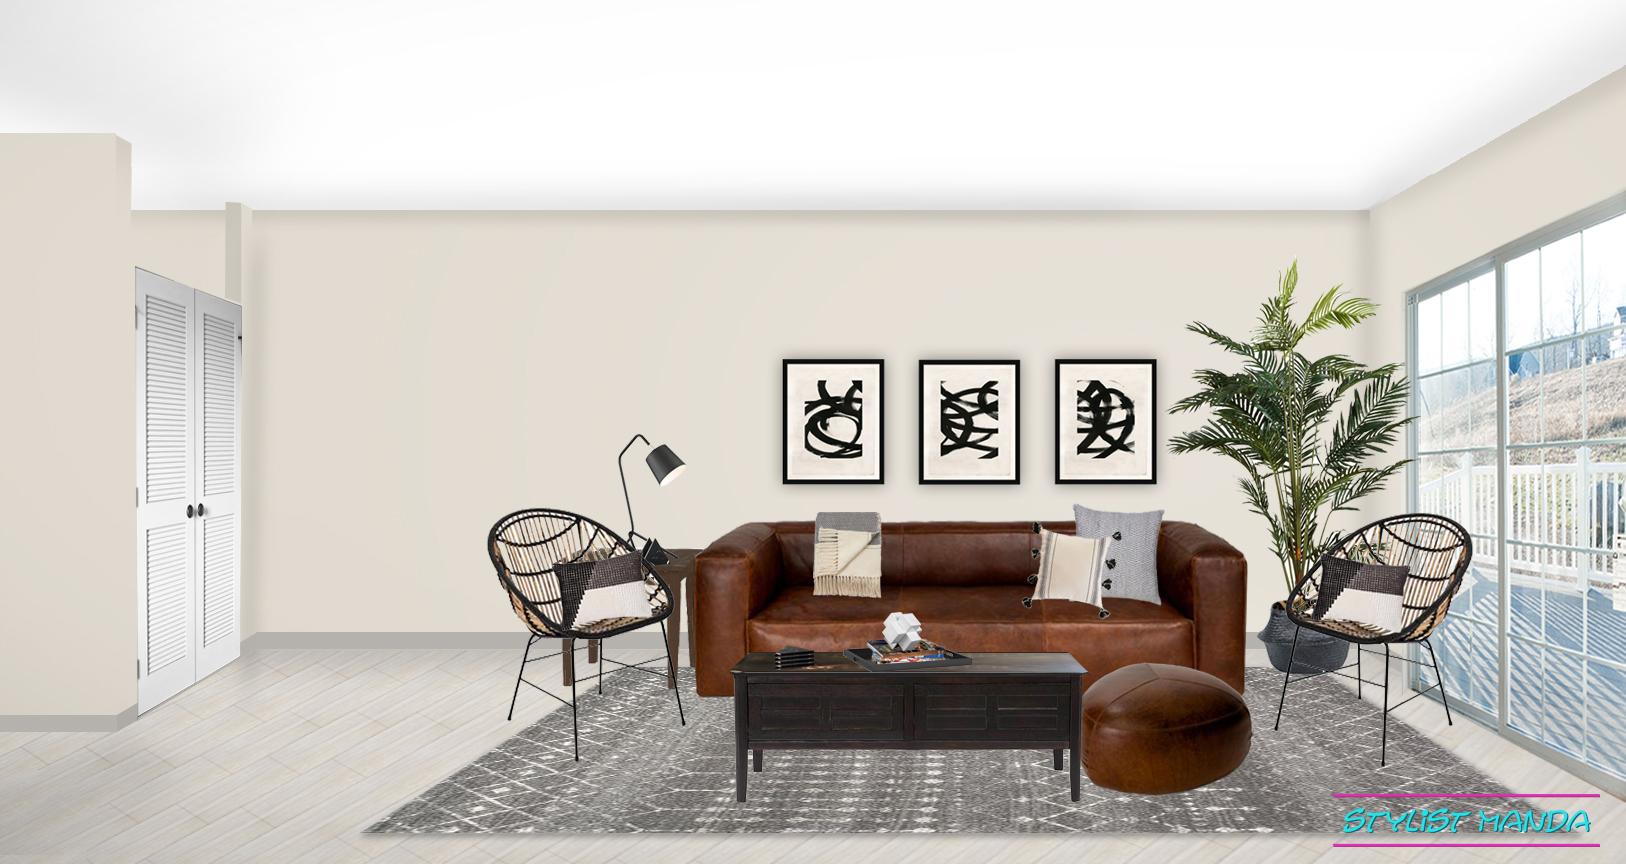 Masculine Living Room Design on a budget #edesign